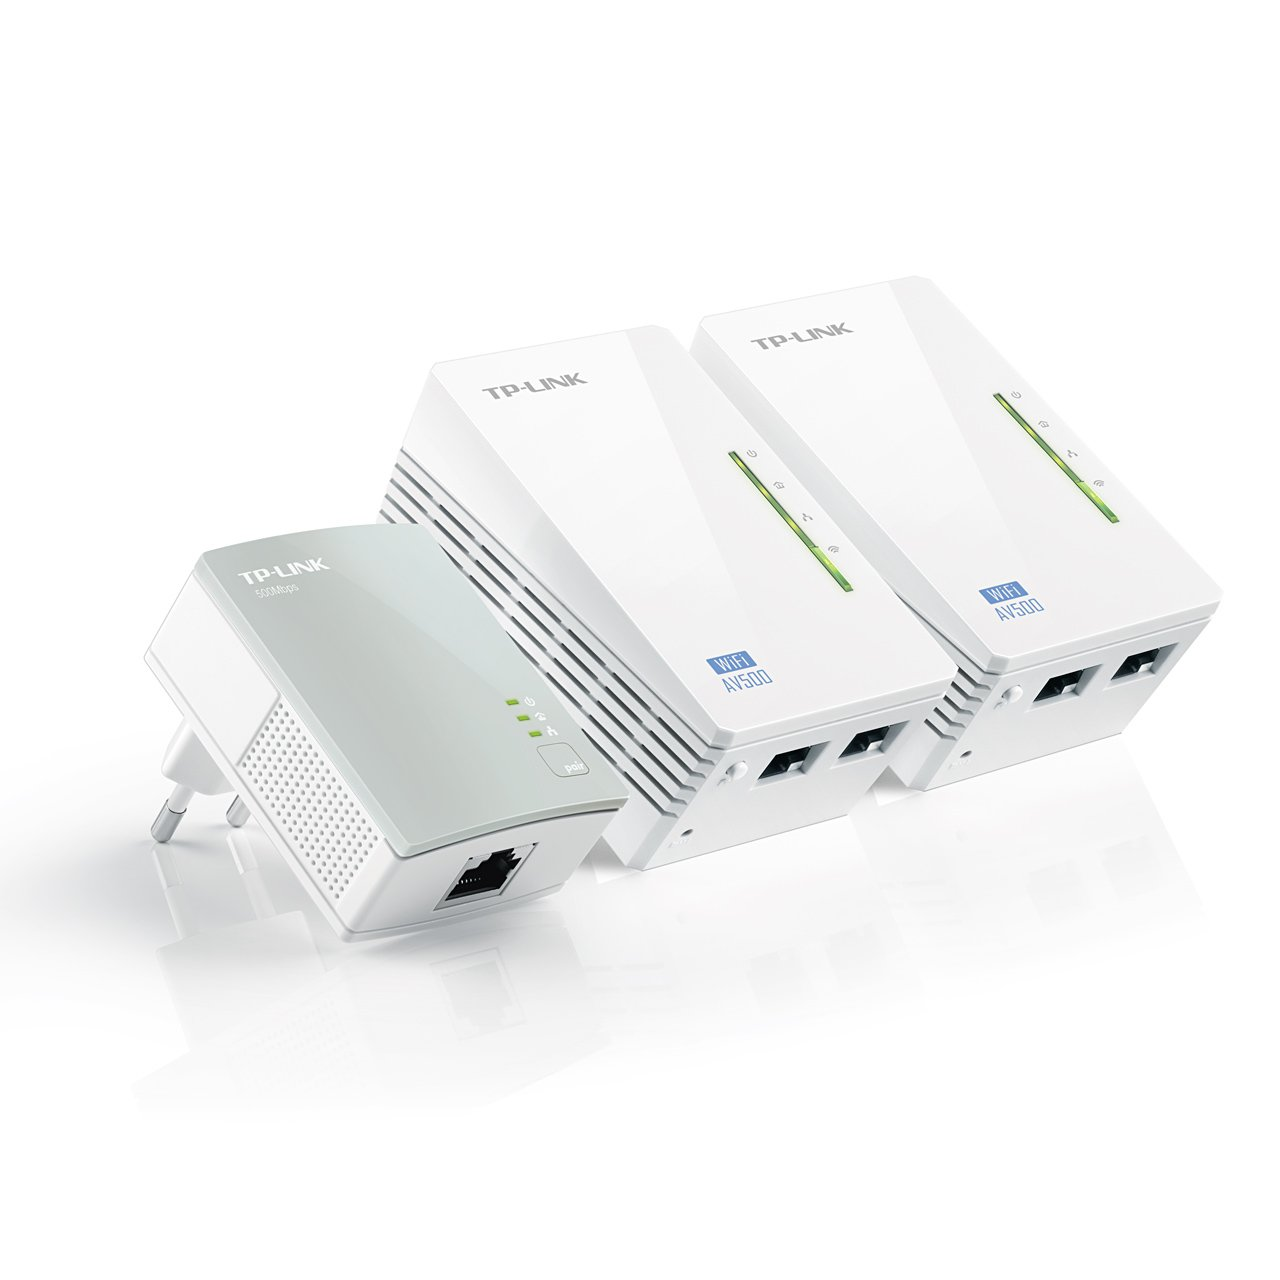 TP LINK TL WPAT KIT Kit extensor de red por línea eléctrica